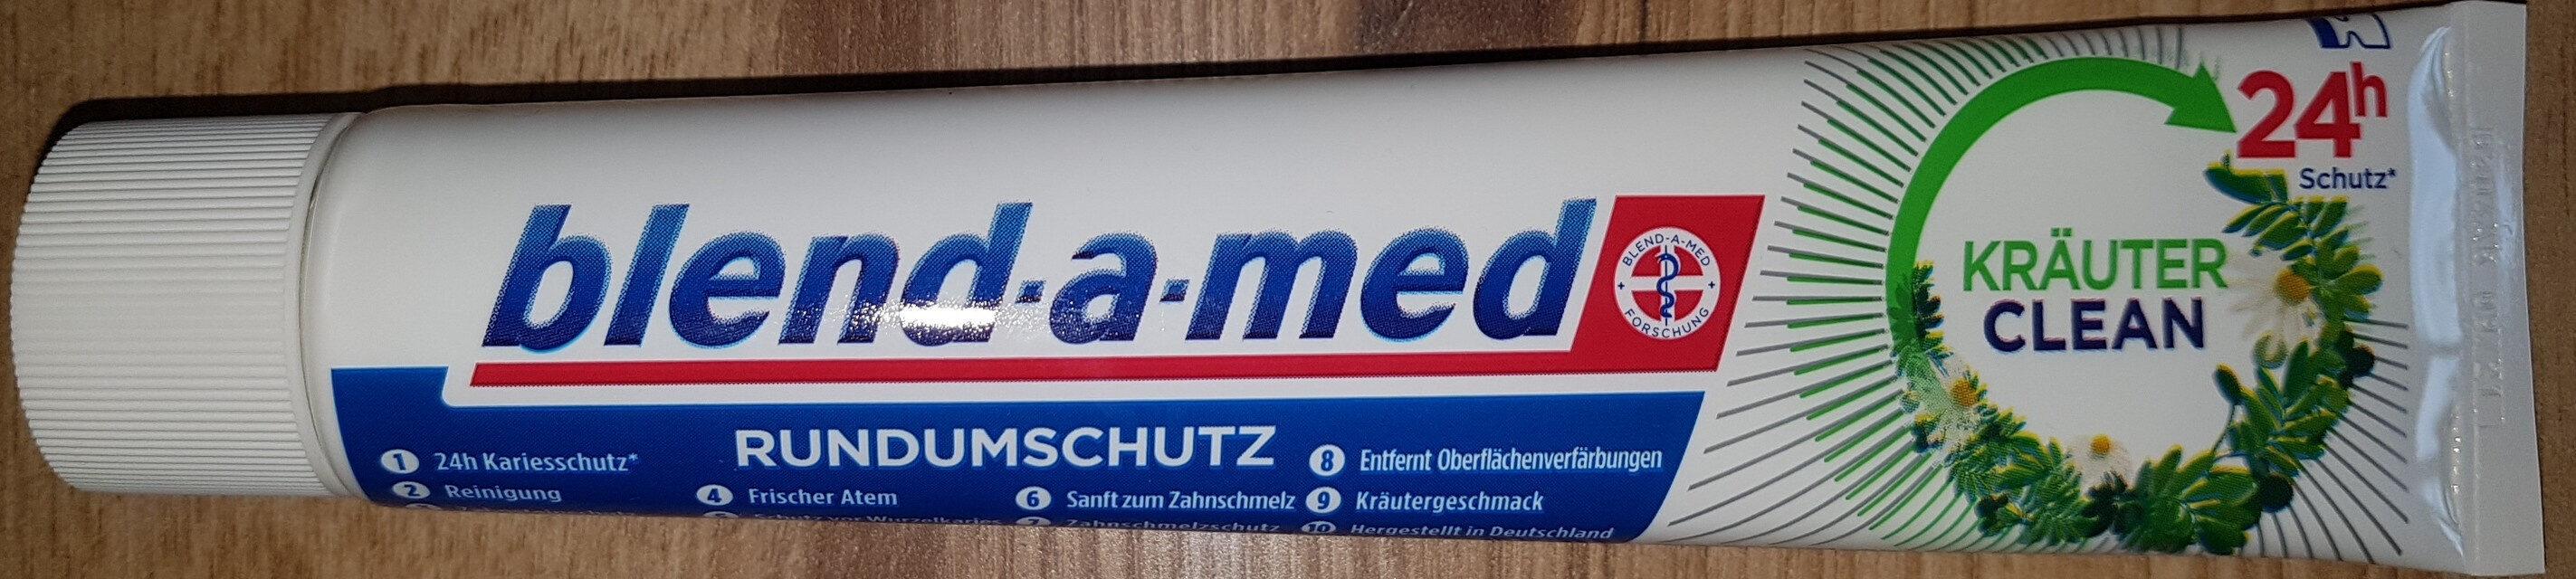 Kräuter Clean - Product - de